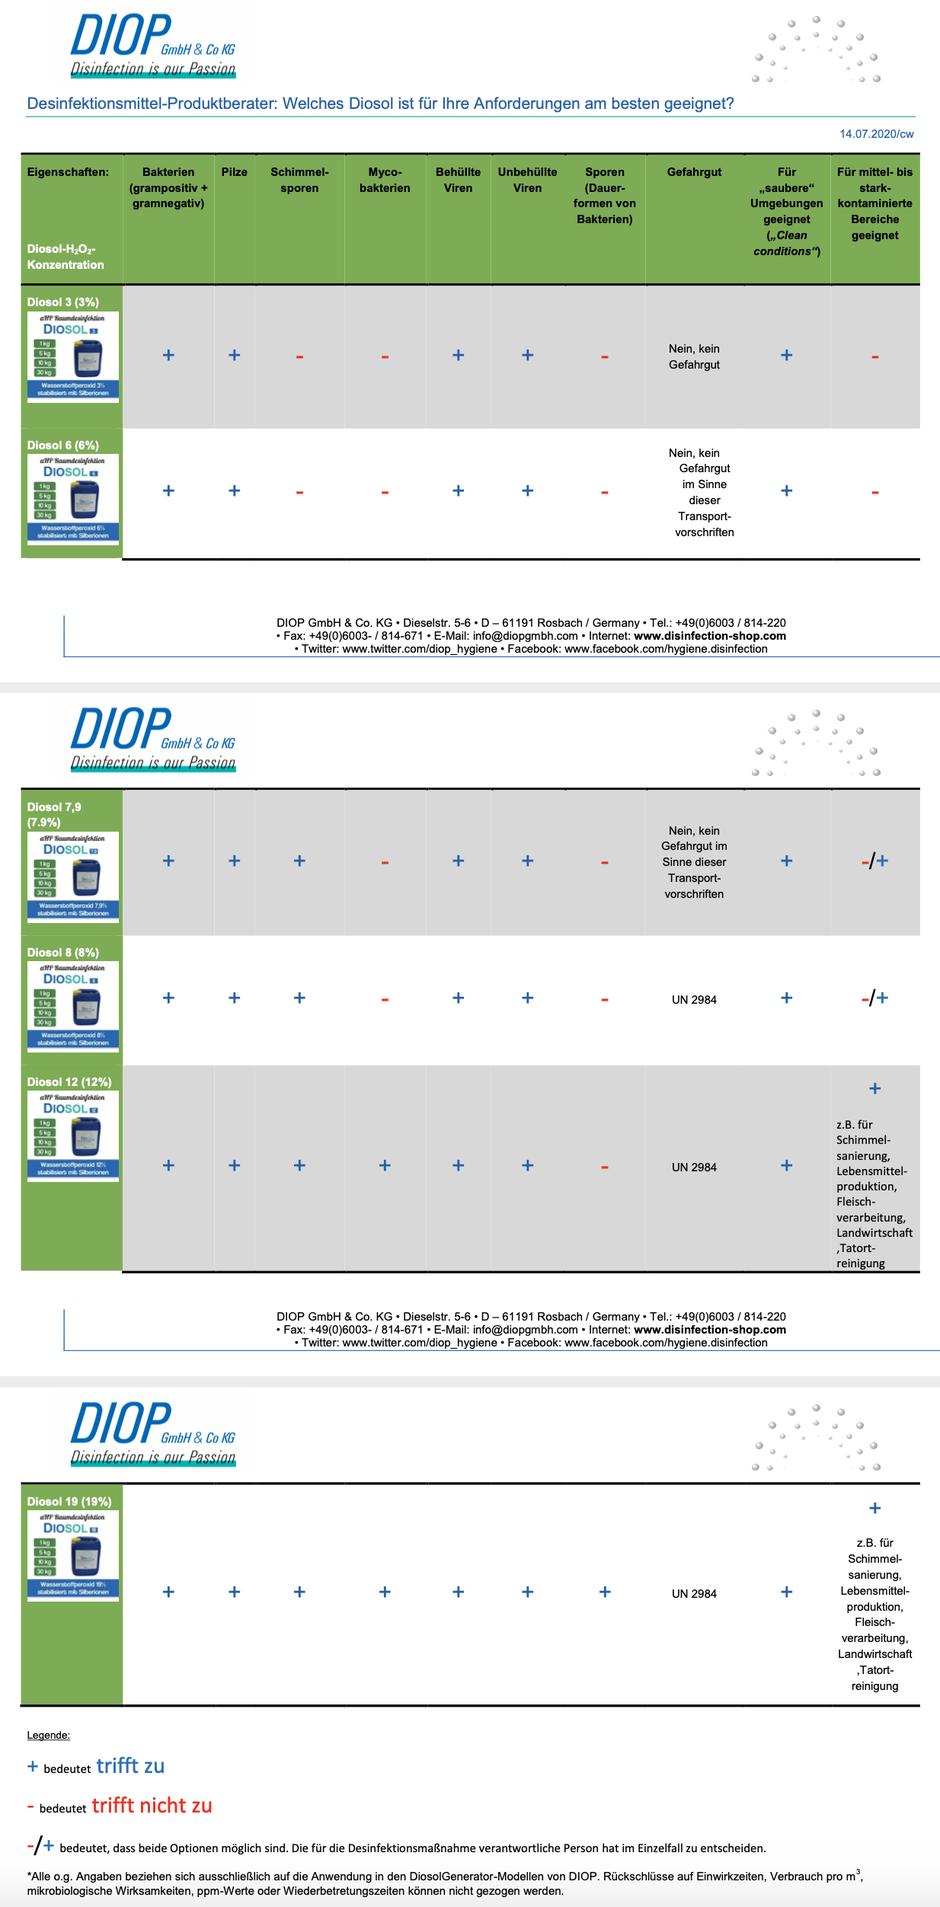 mueden.de, Flächendesinfektion, Bild Desinfektion-Produktberater